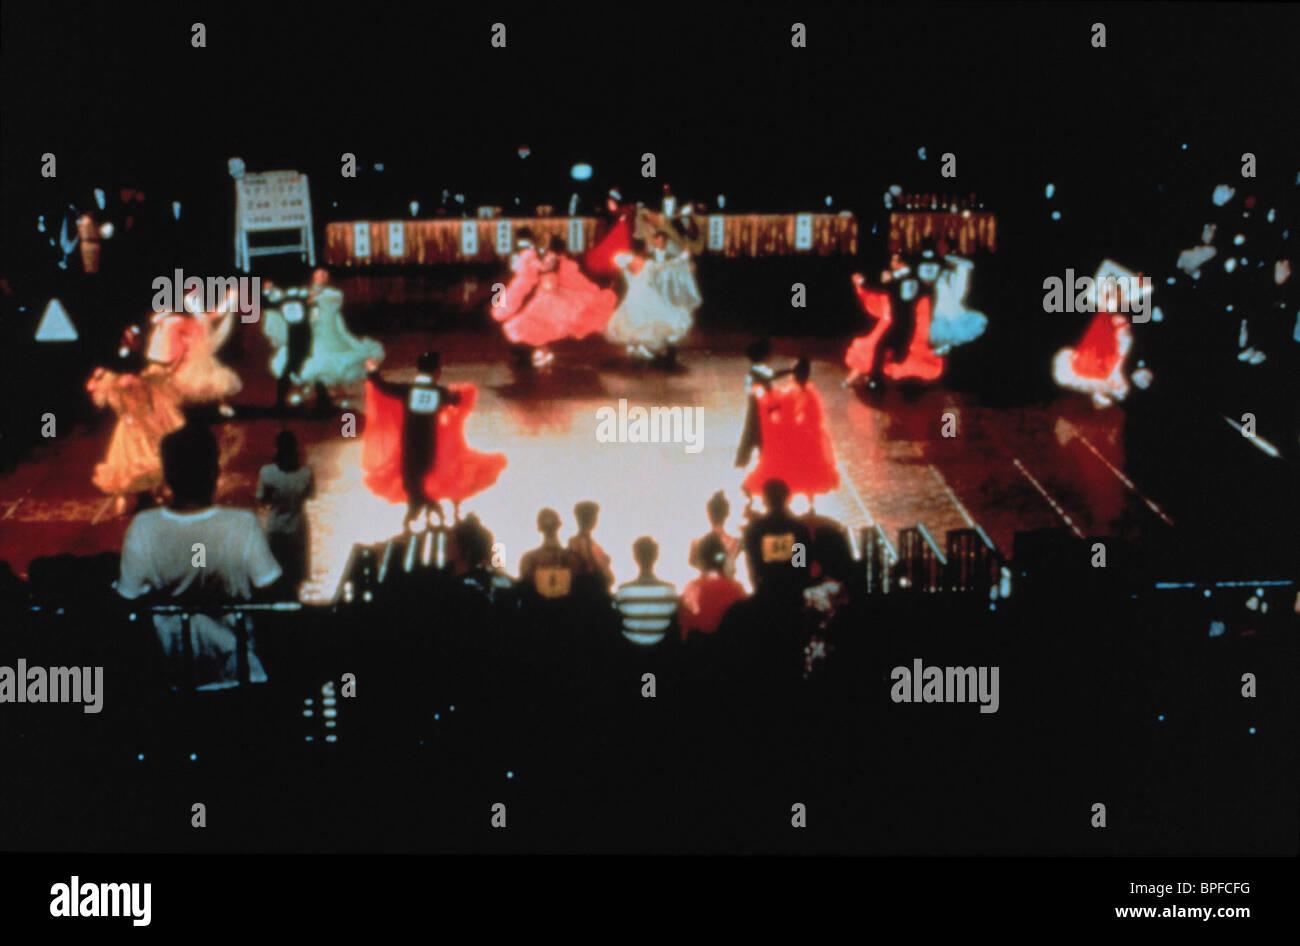 shall we dance 1996 movie